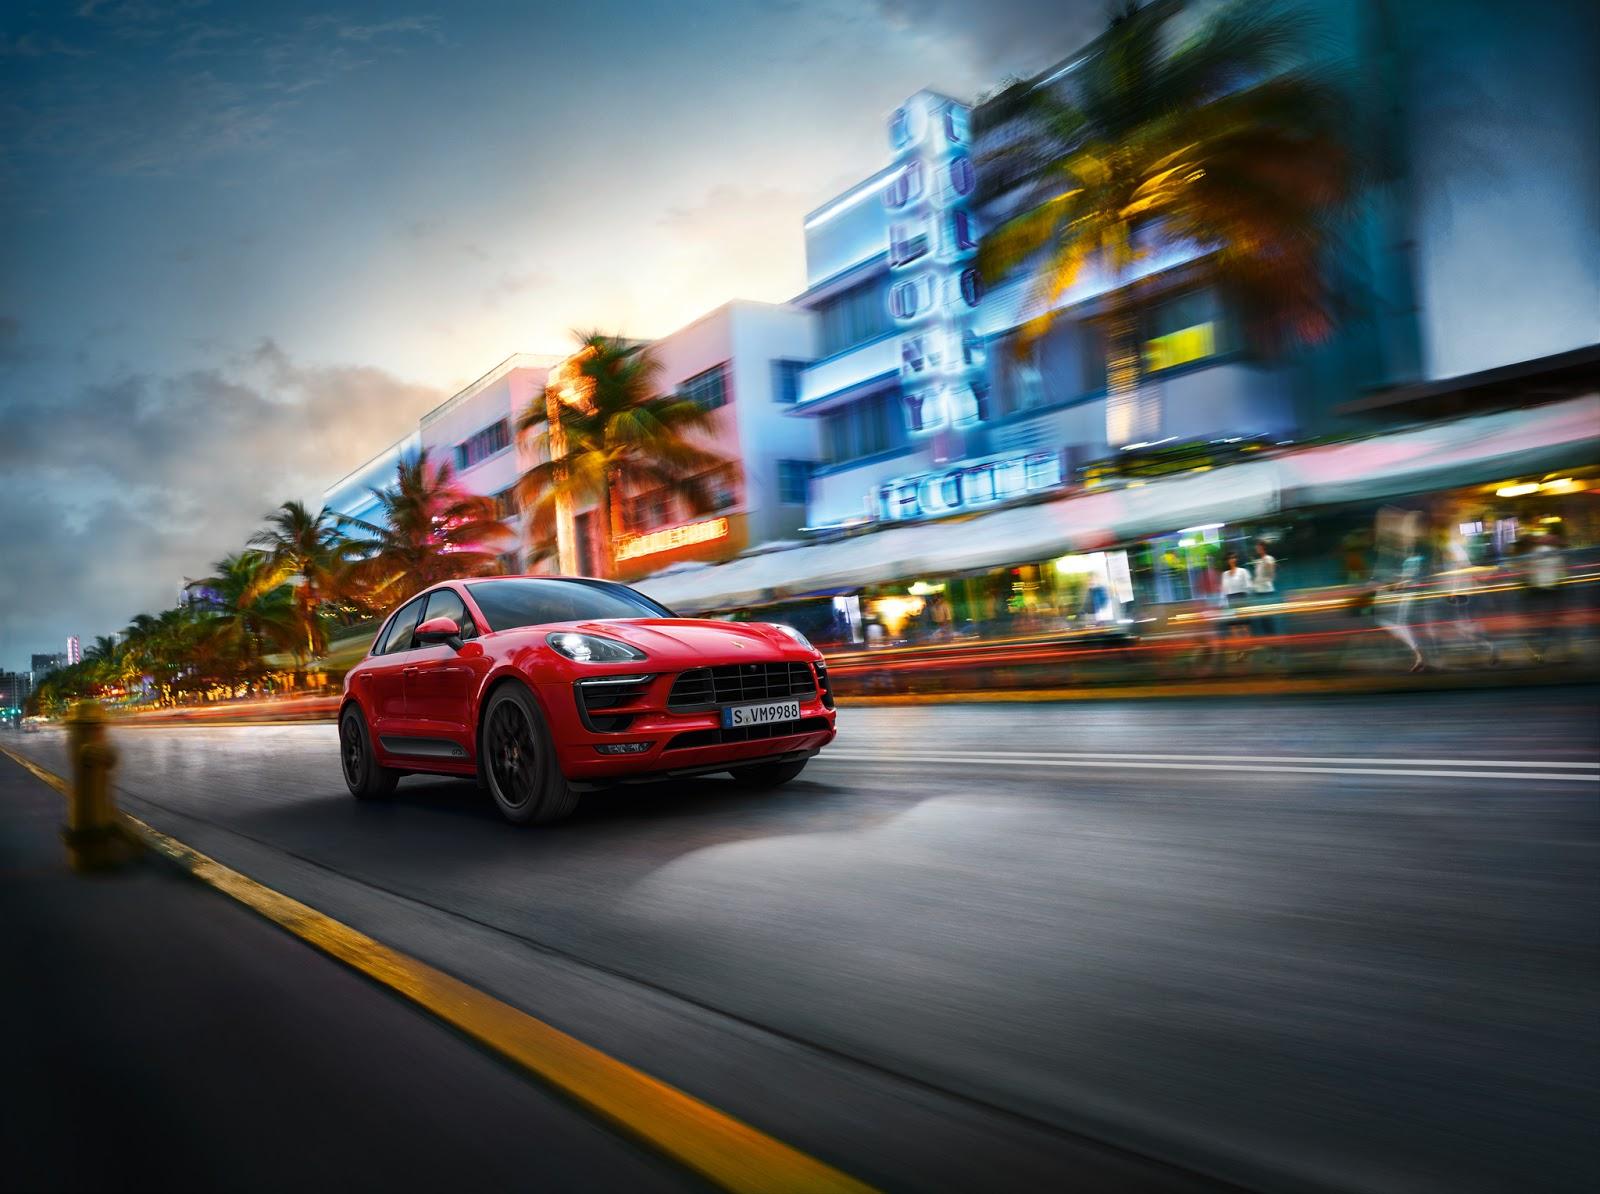 MA17T07OX0002 1 low Με 360 άλογα από τον τρίλιτρο V6 biturbo έρχεται η Porsche Macan GTS Macan, Porsche, Porsche Macan, Porsche Macan GTS, videos